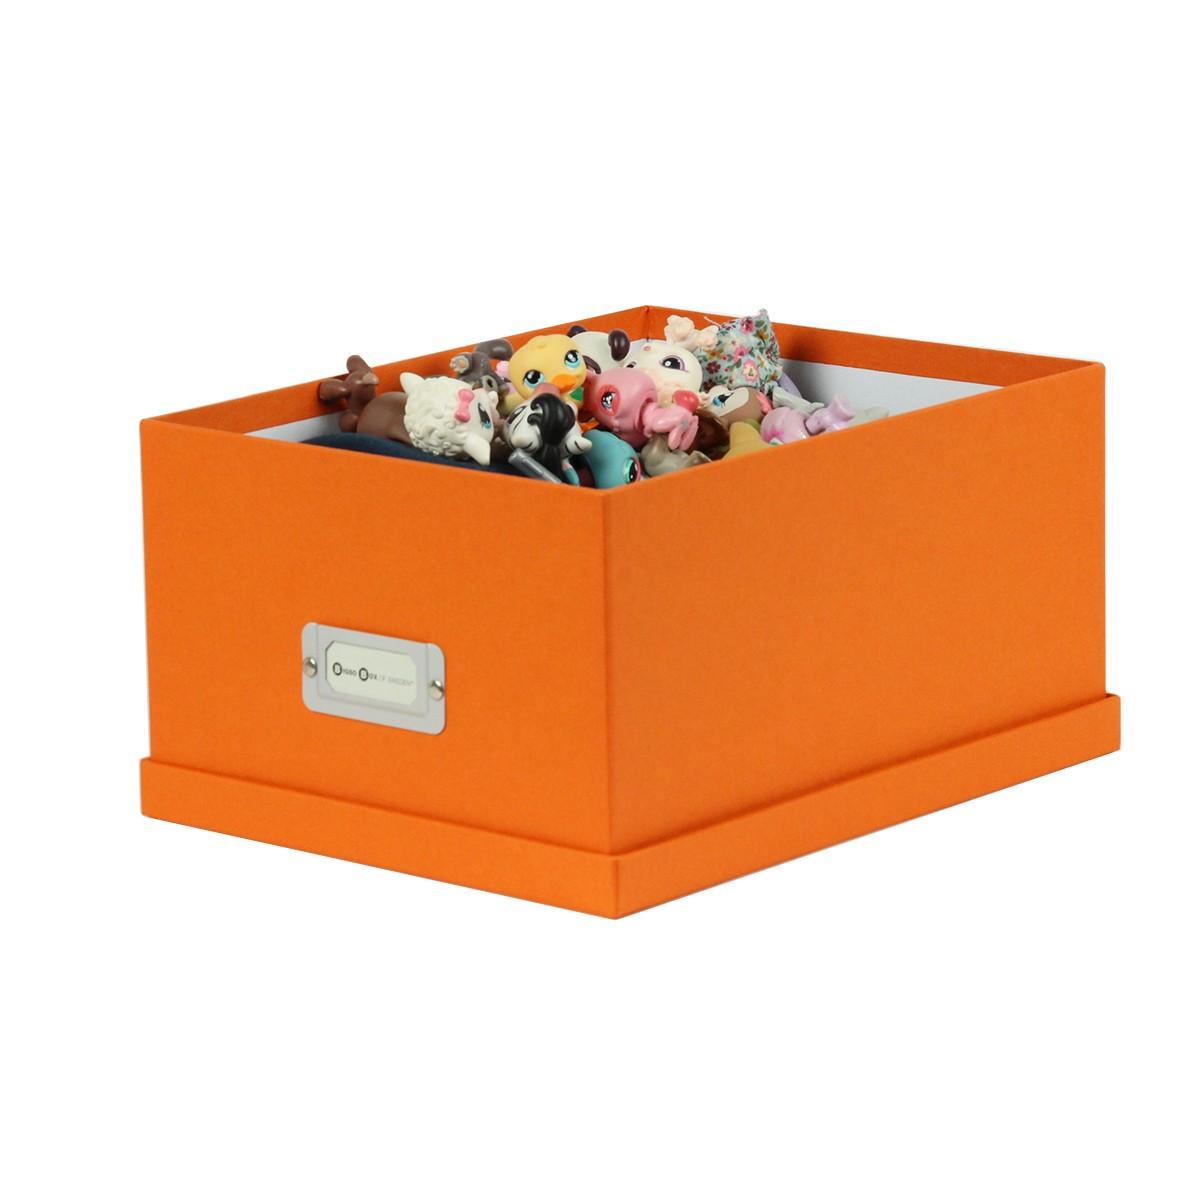 bo te en carton orange rangement jeux. Black Bedroom Furniture Sets. Home Design Ideas